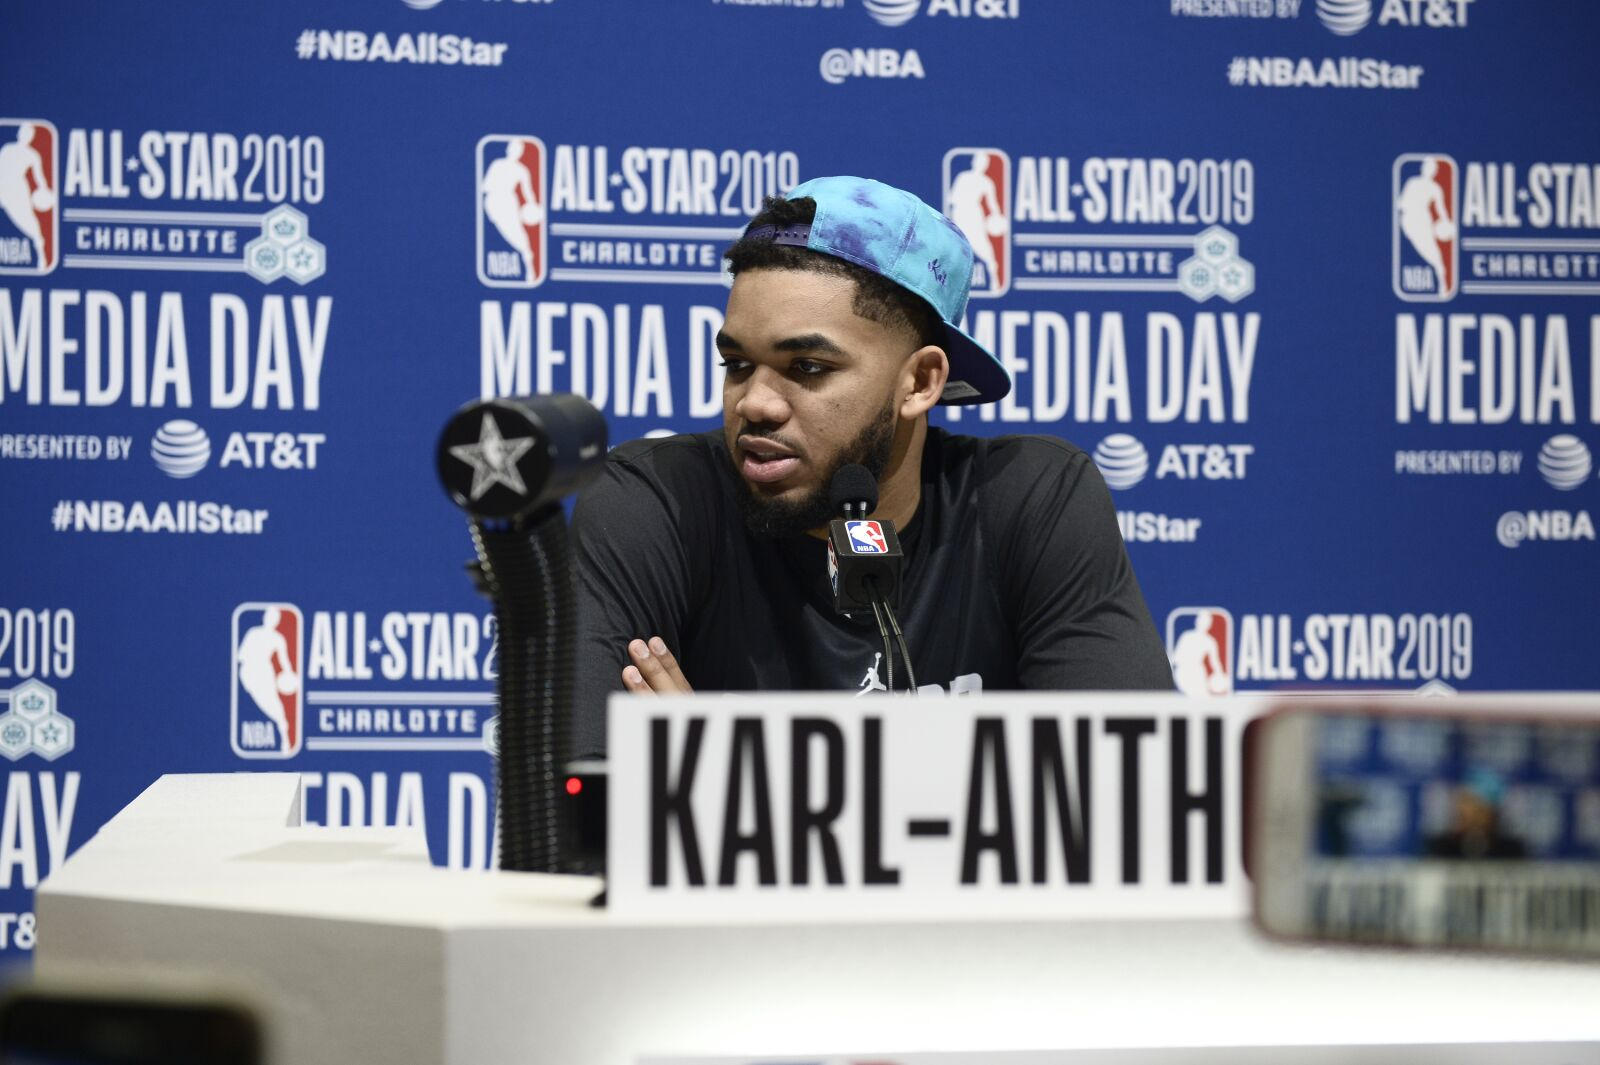 Minnesota Timberwolves: All-Star Sunday, starring Karl-Anthony Towns